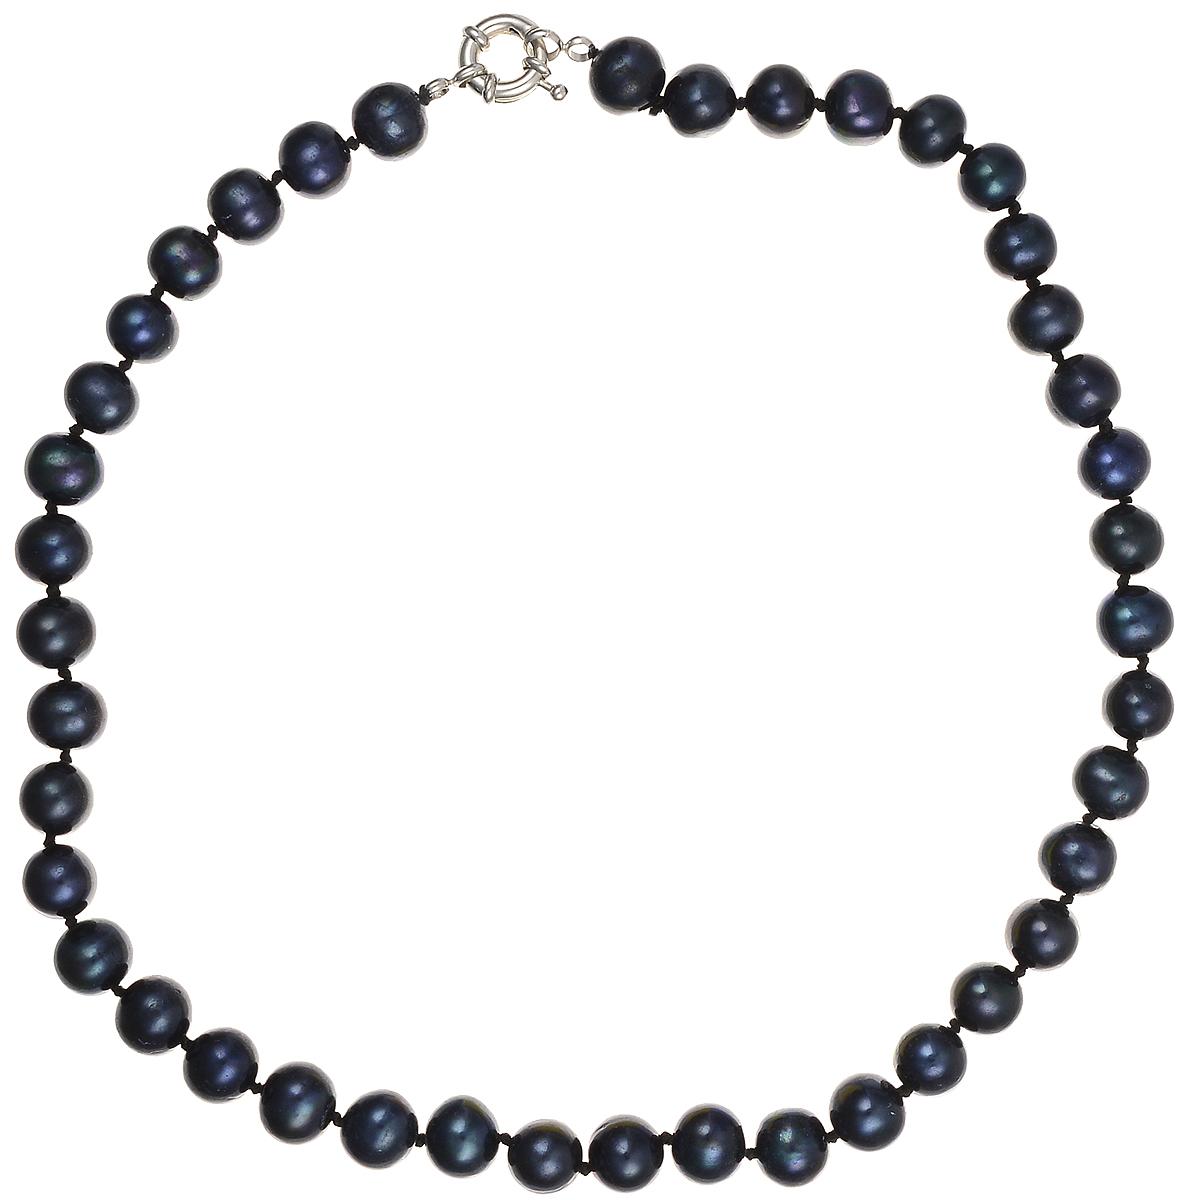 Бусы Art-Silver, цвет: синий, длина 45 см. КЖ9-10АА45-1173